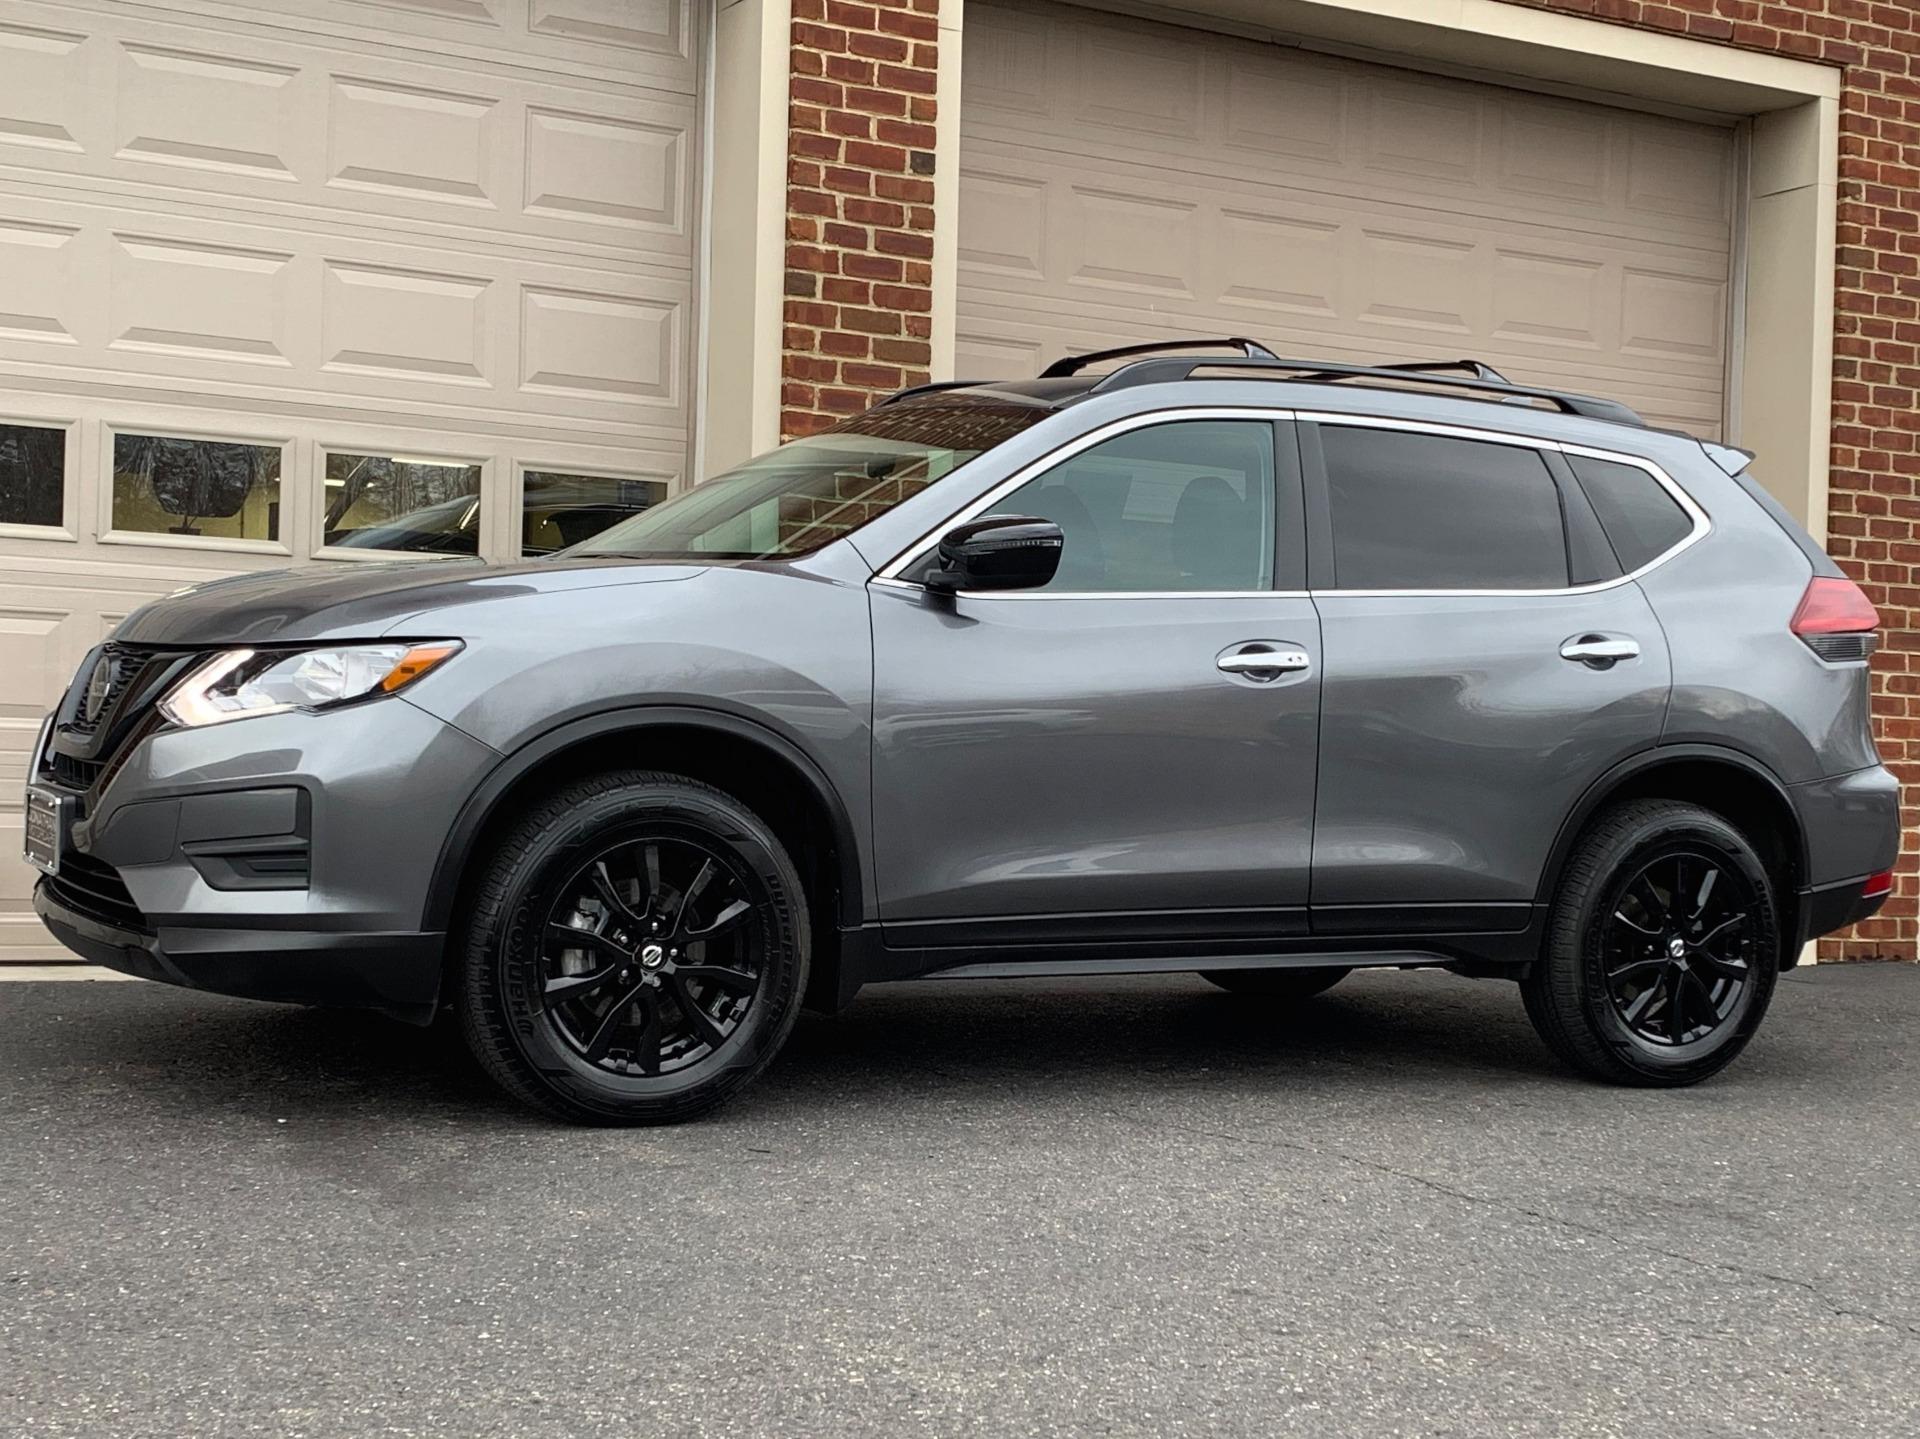 Used-2018-Nissan-Rogue-SV--Midnight-Edition